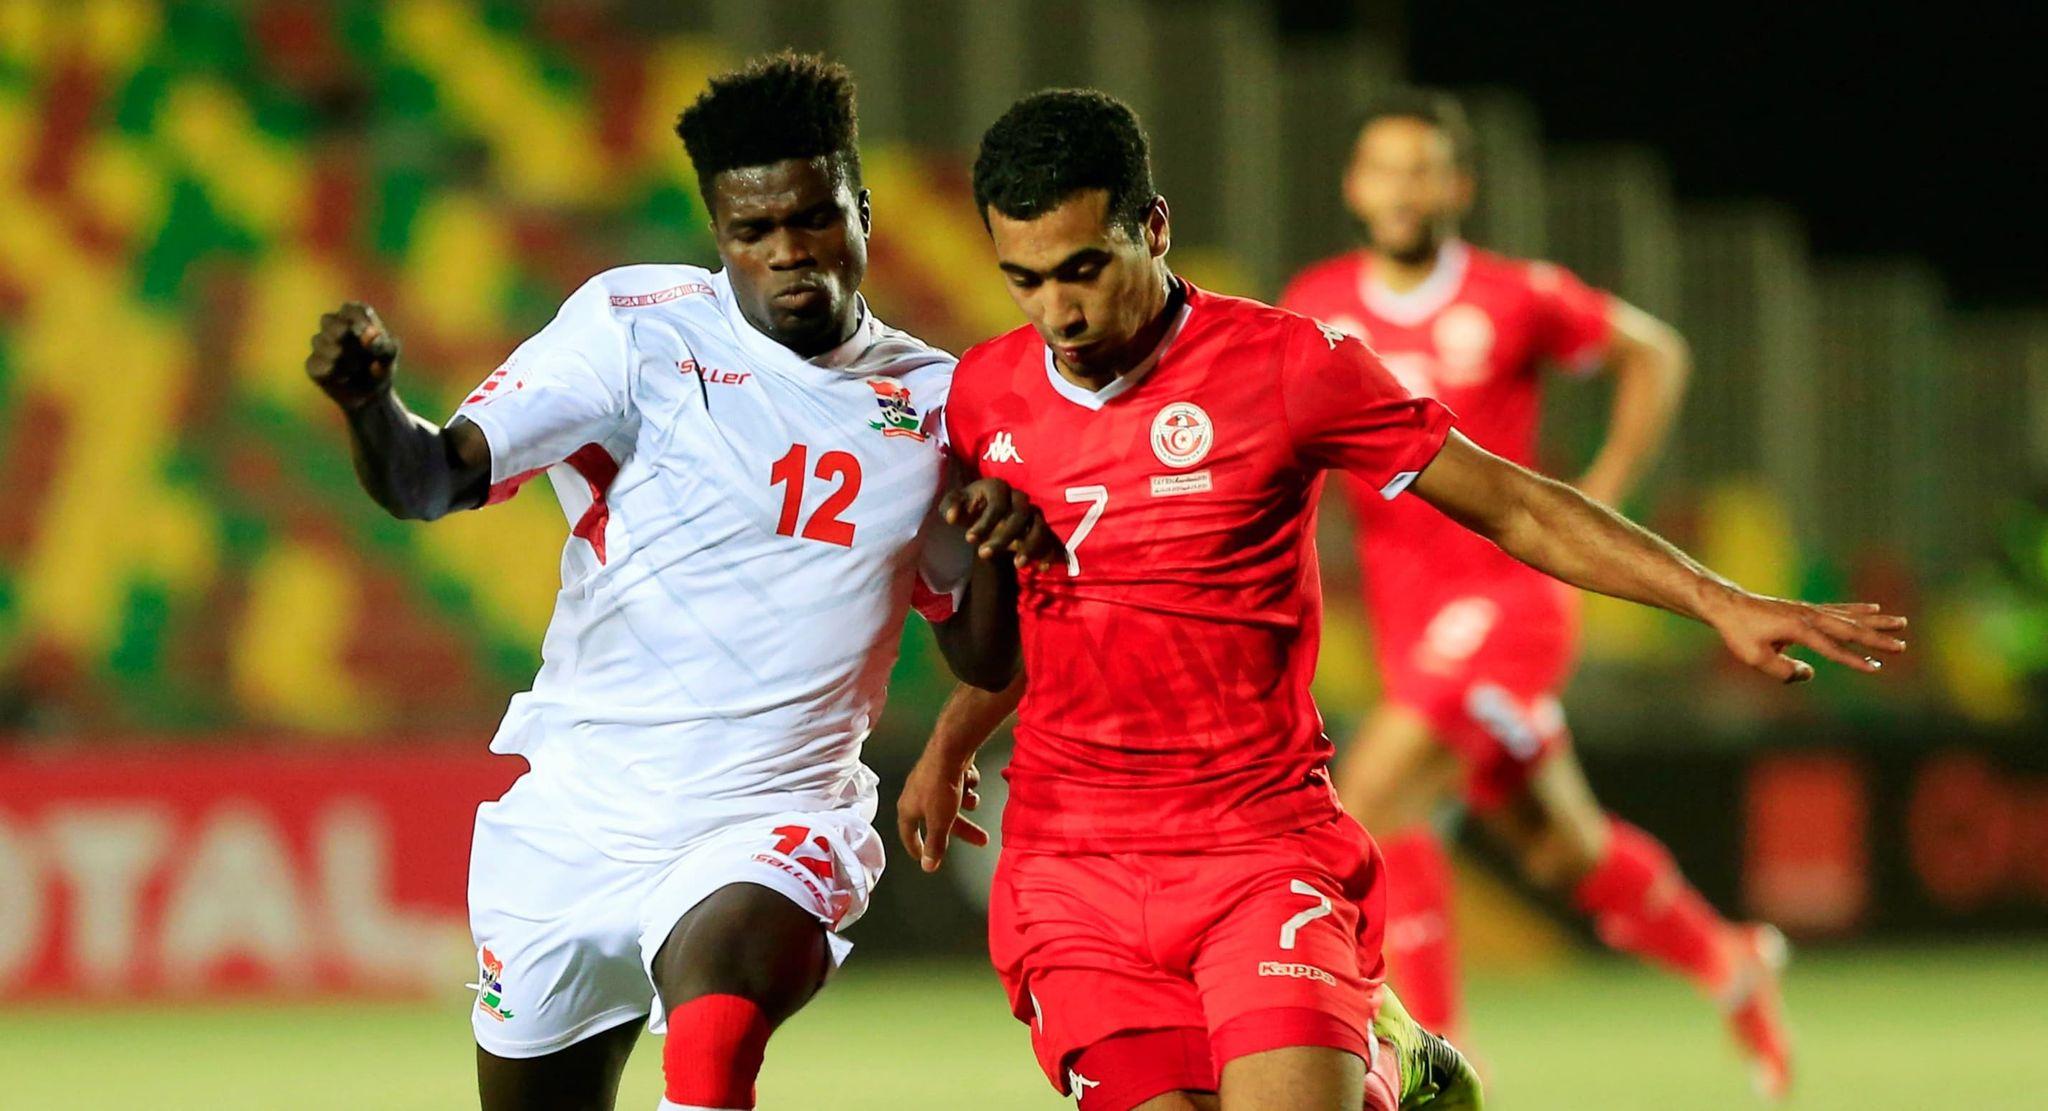 The Gambia beat Tunisia to win U20 Afcon bronze